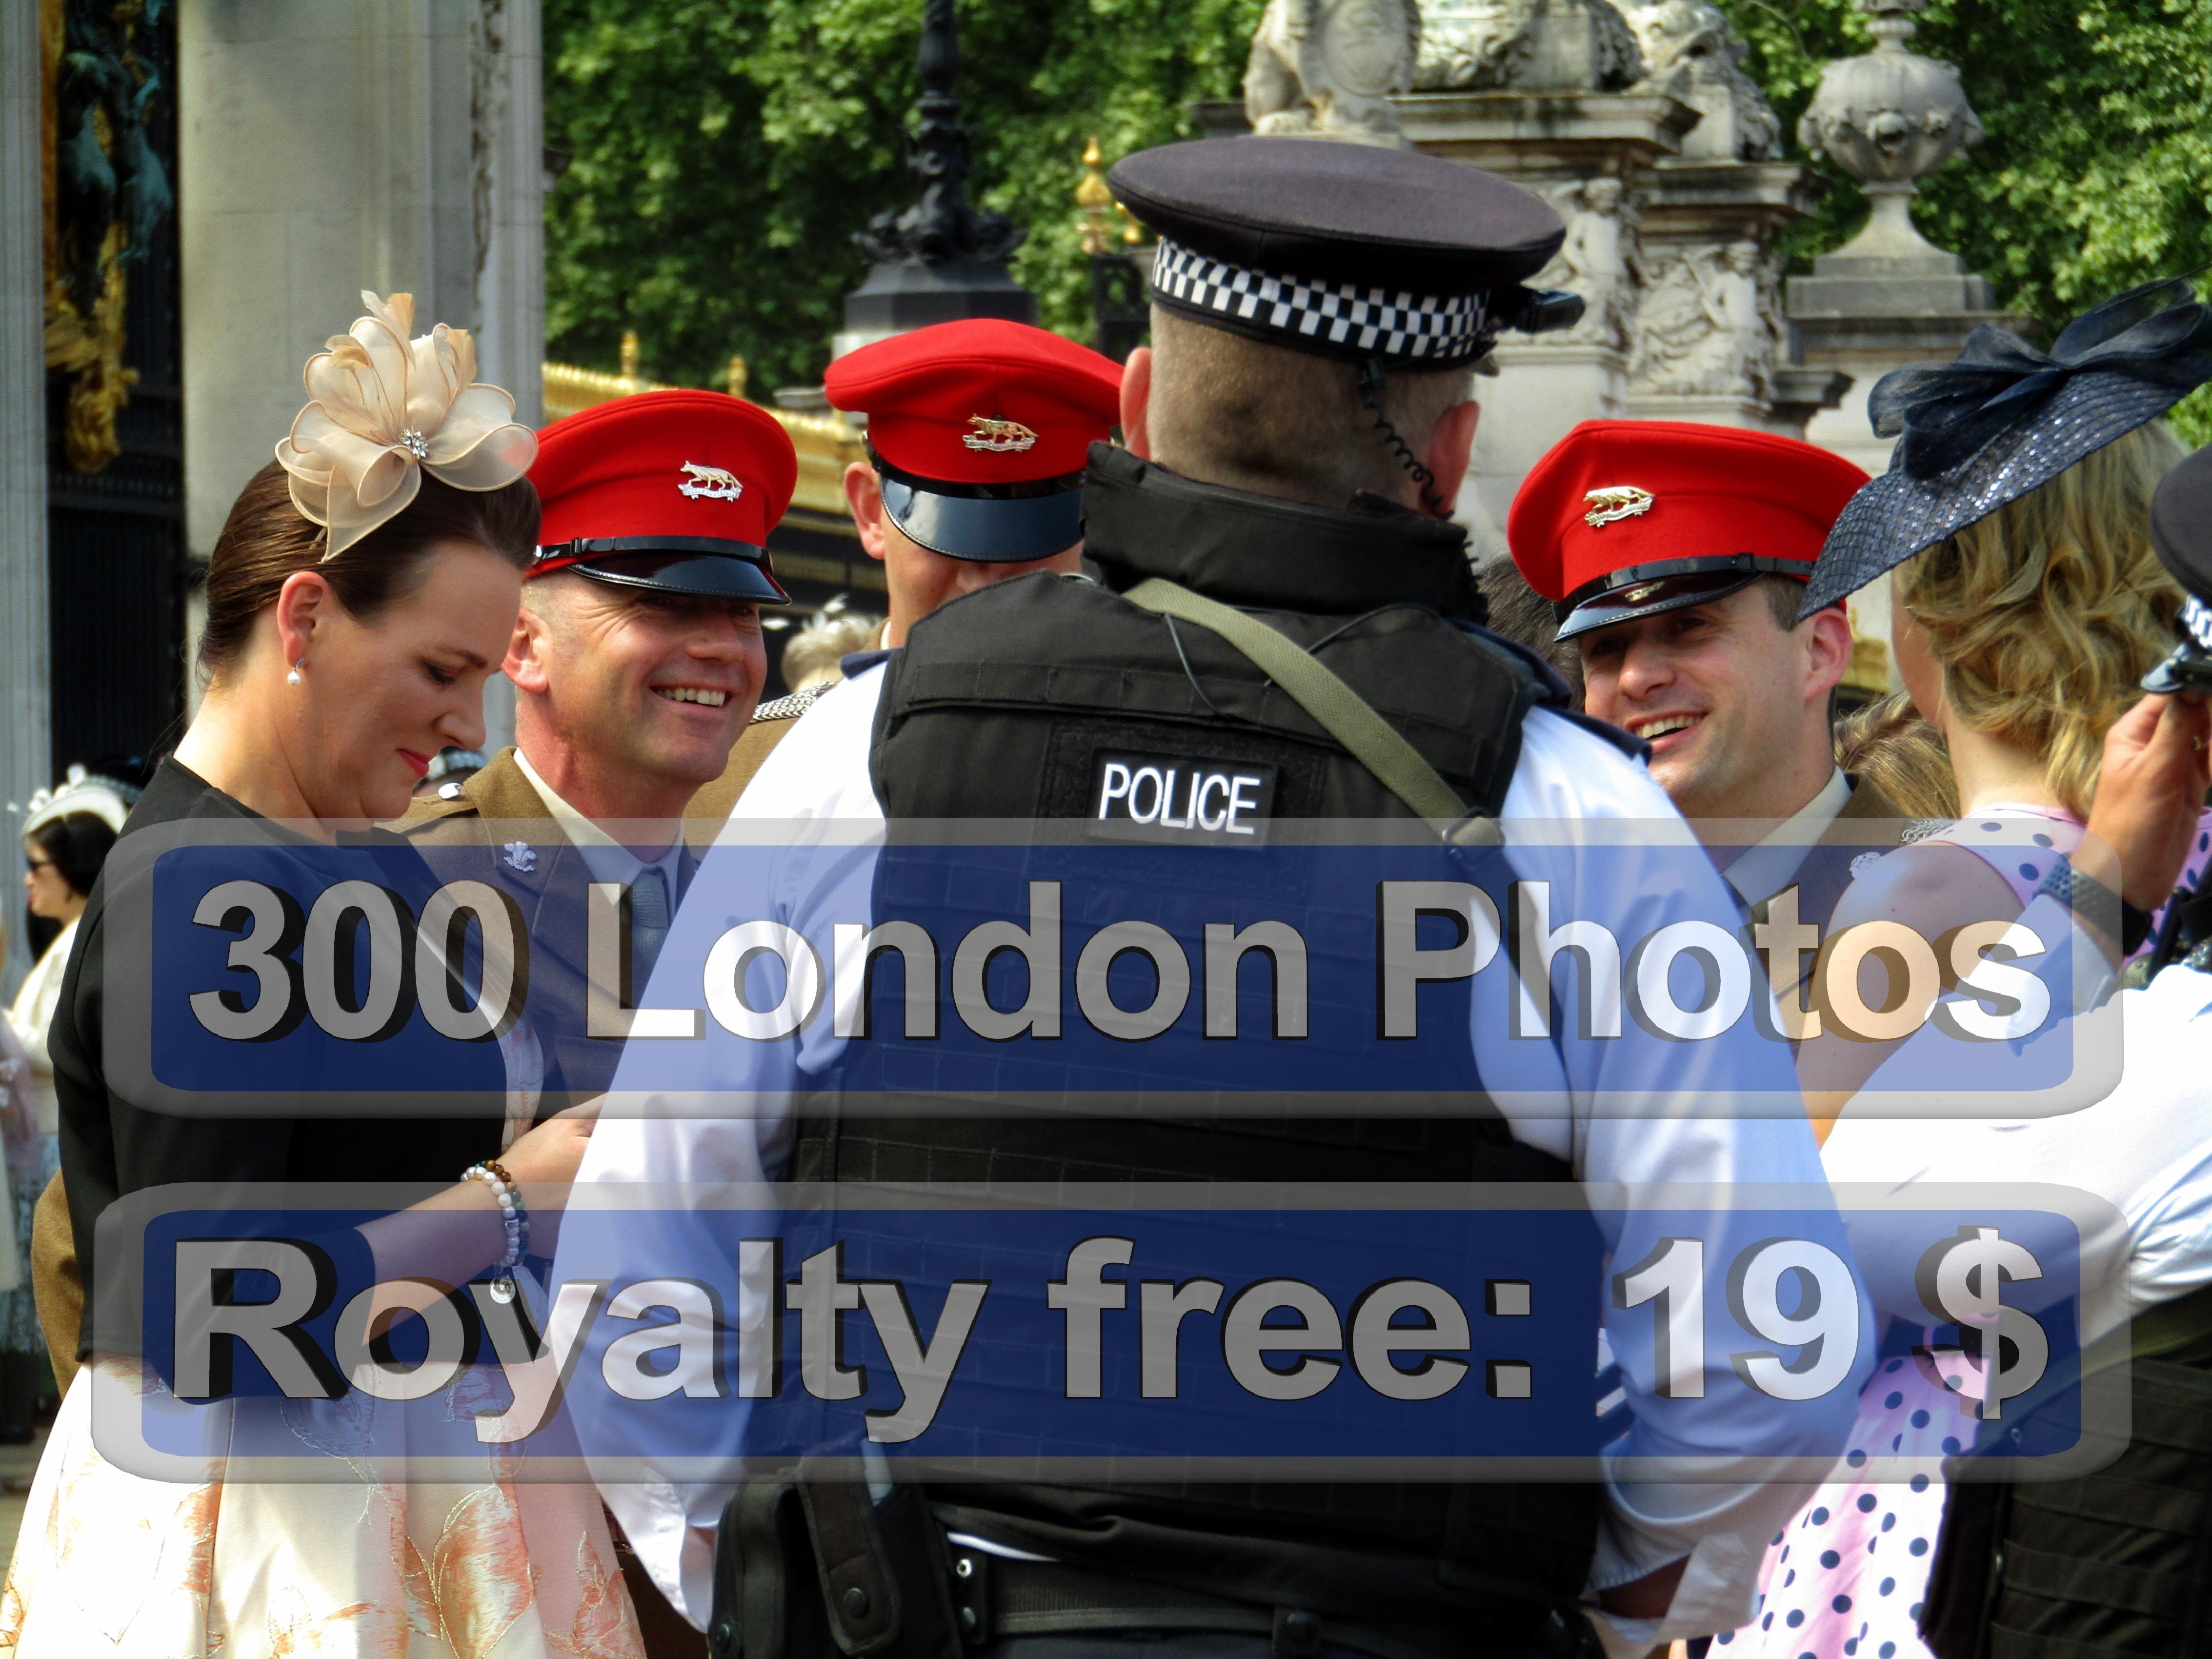 London Photo Developing